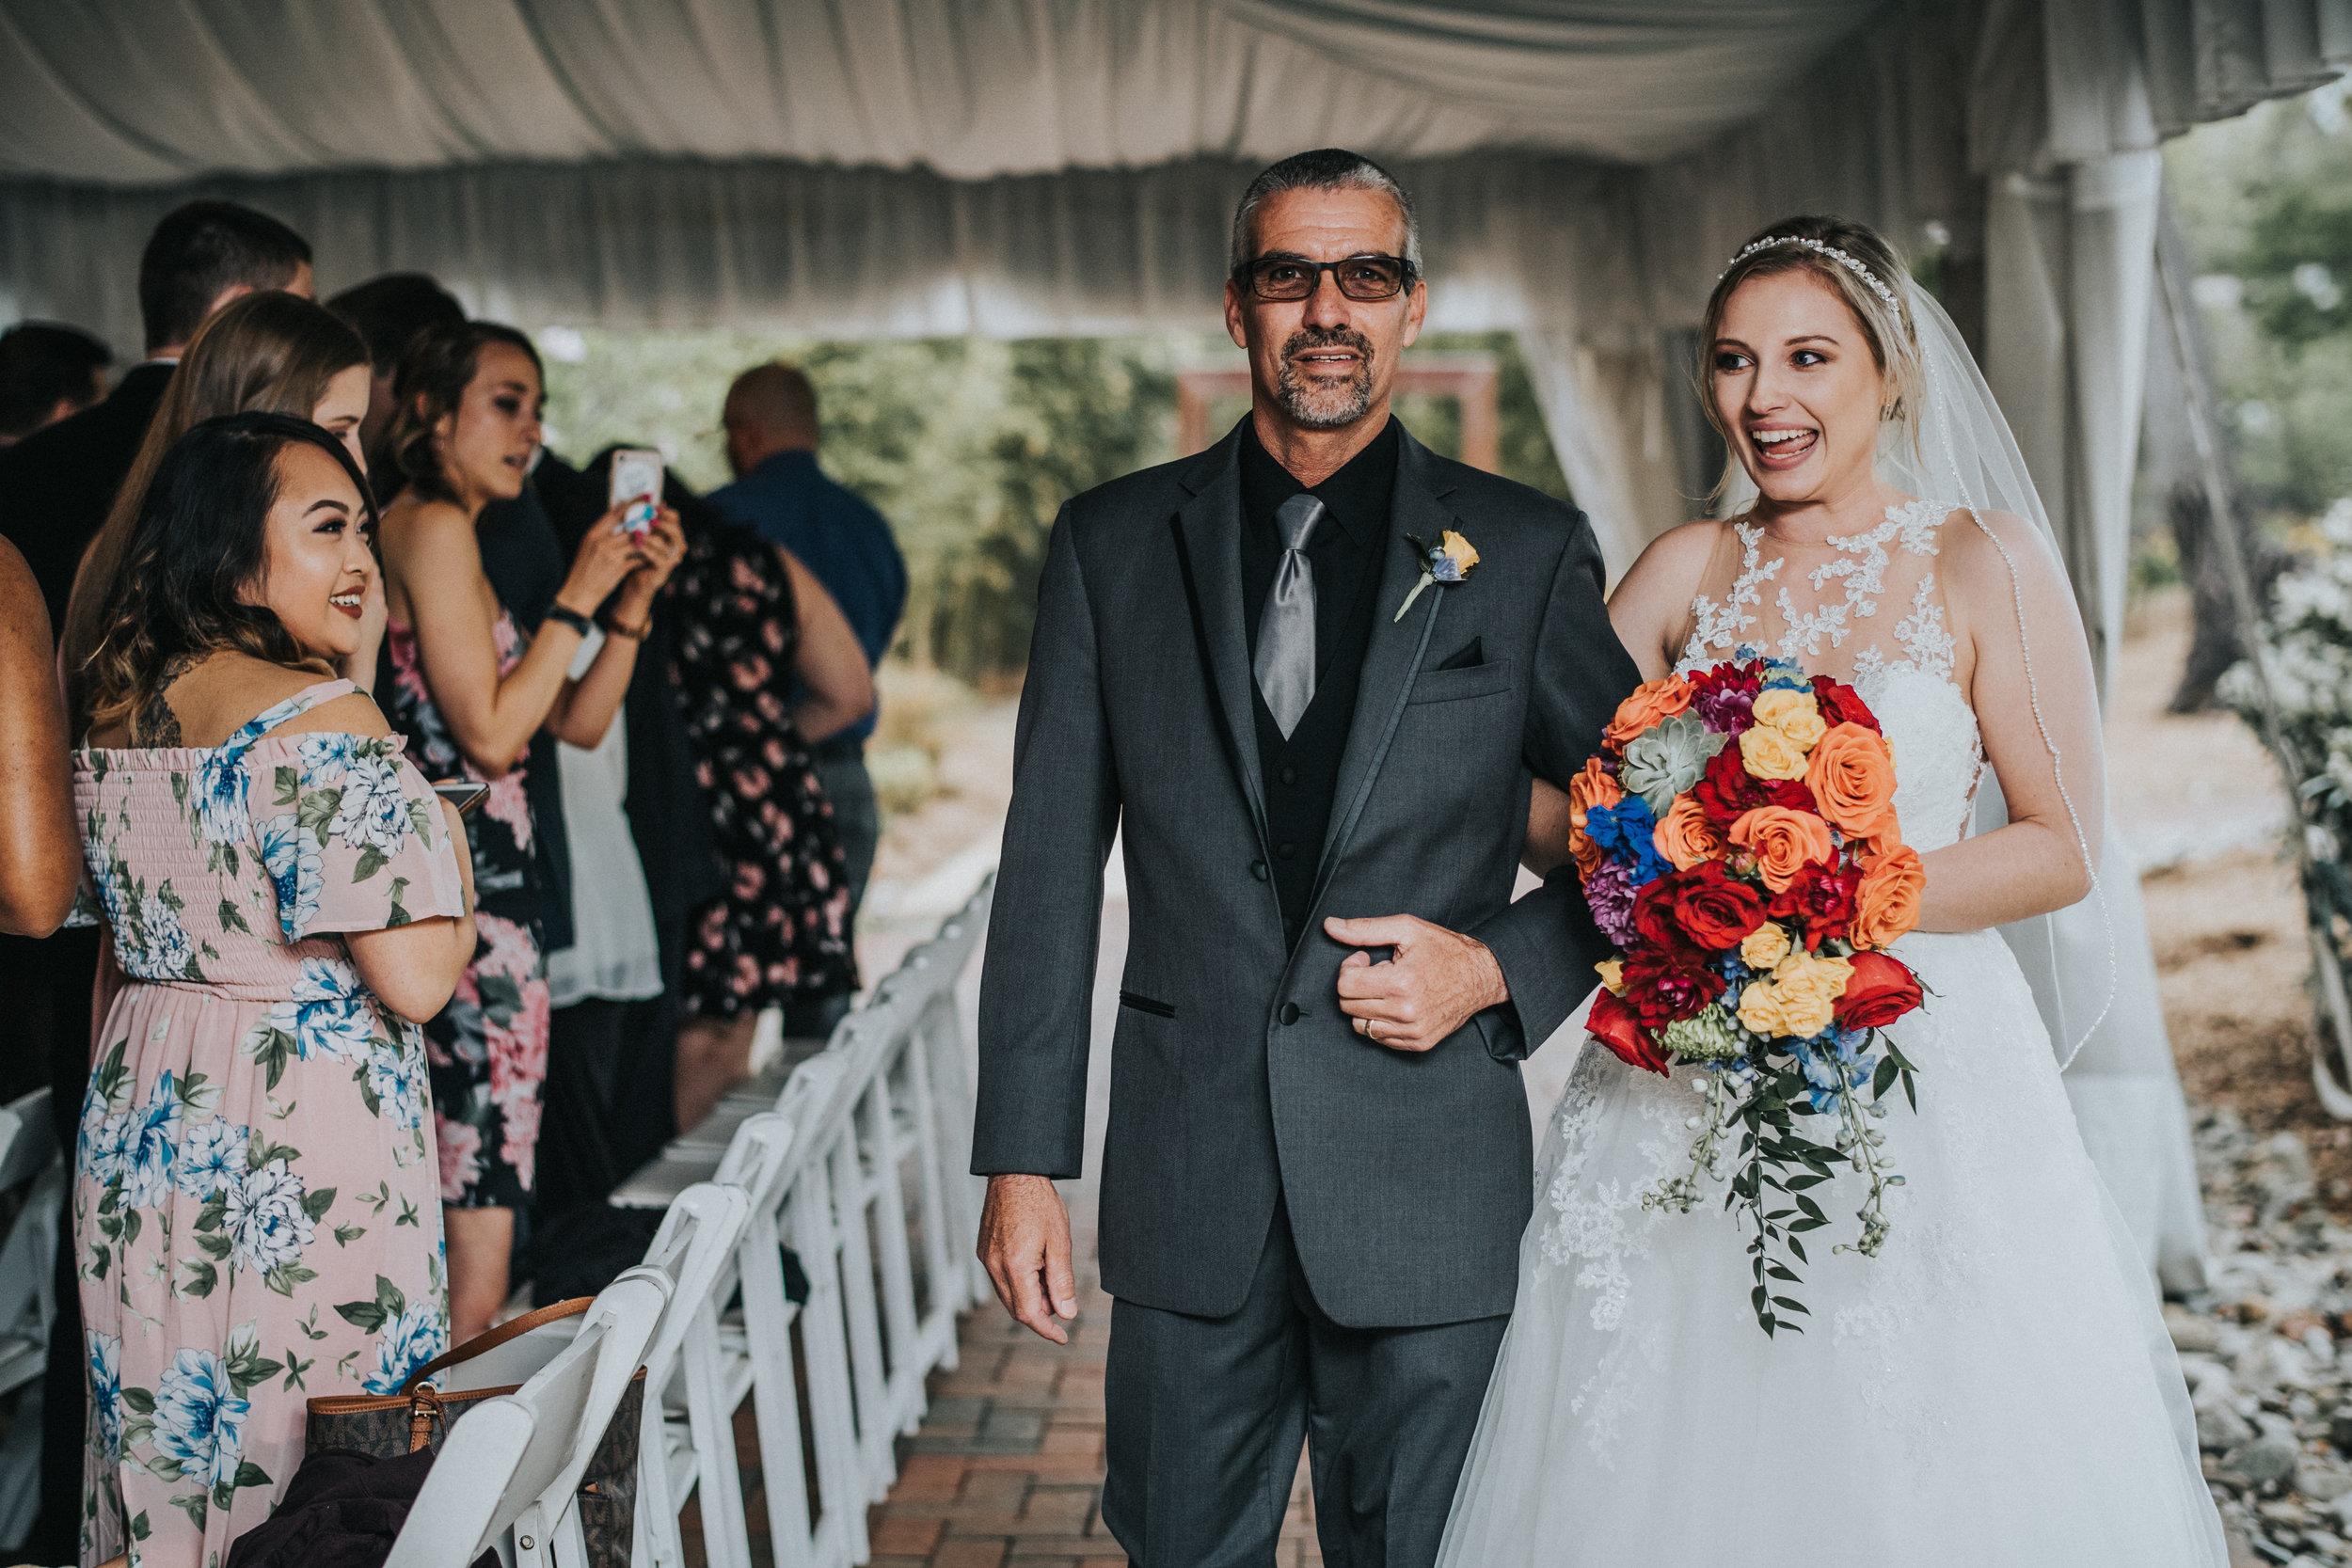 New-Jersey-Wedding-Photographer-Megan&Nick-Ceremony-69.jpg